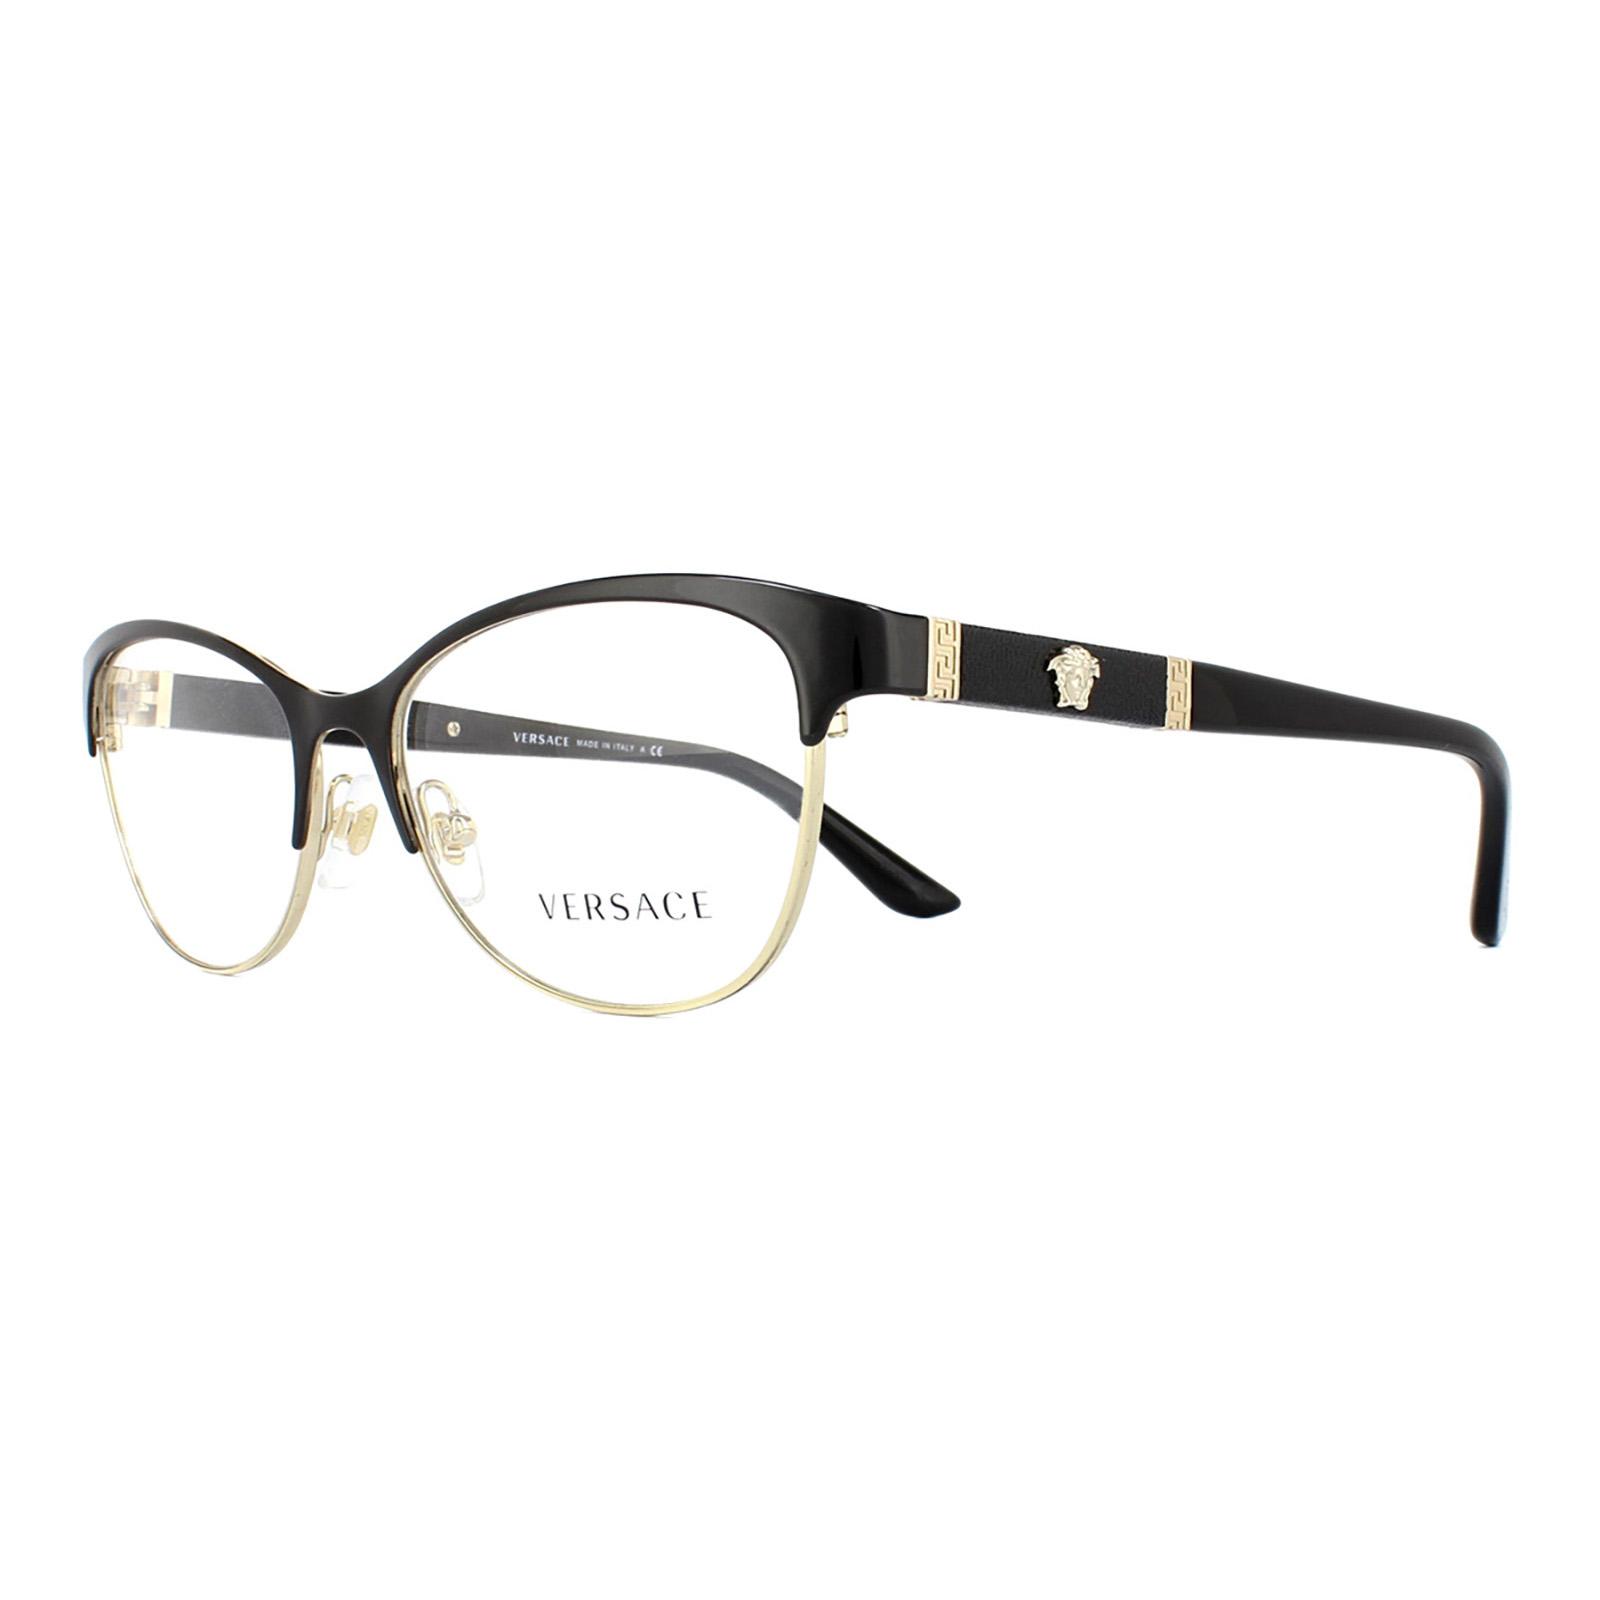 771baffbf647 Discount Versace Eyeglass Frames